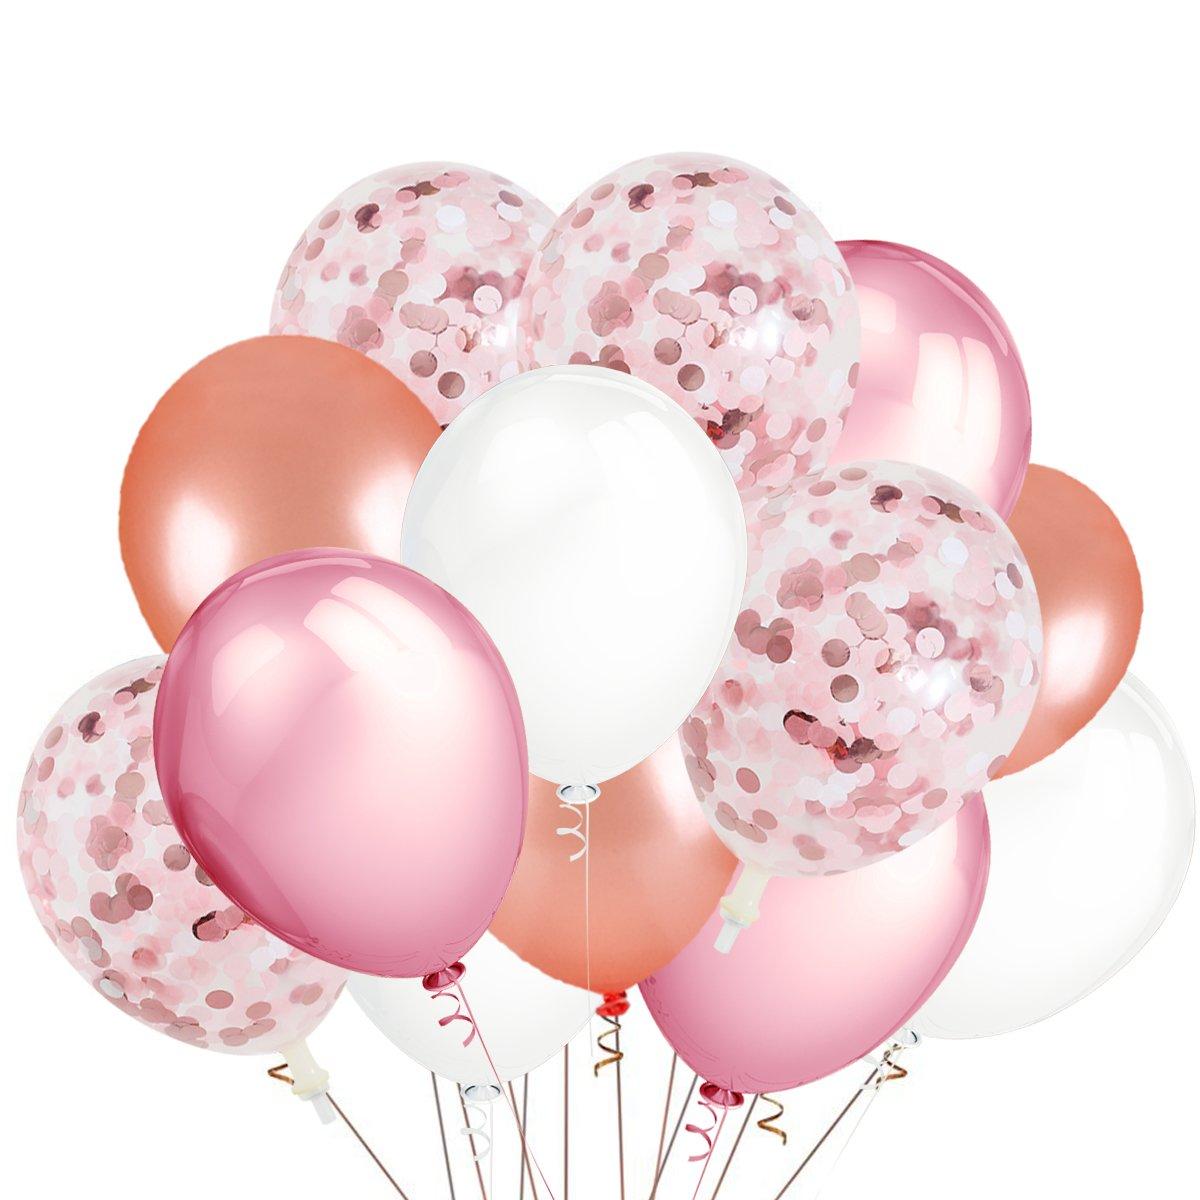 teepollyパーティーバルーン、30パックローズゴールド&ピンク&ホワイト色ラテックスバルーンと12パックローズゴールド&ピンク&ホワイト色紙吹雪balloons-bachelorette/ウェディング/ベビーシャワー/誕生日装飾   B07F1K6WYW